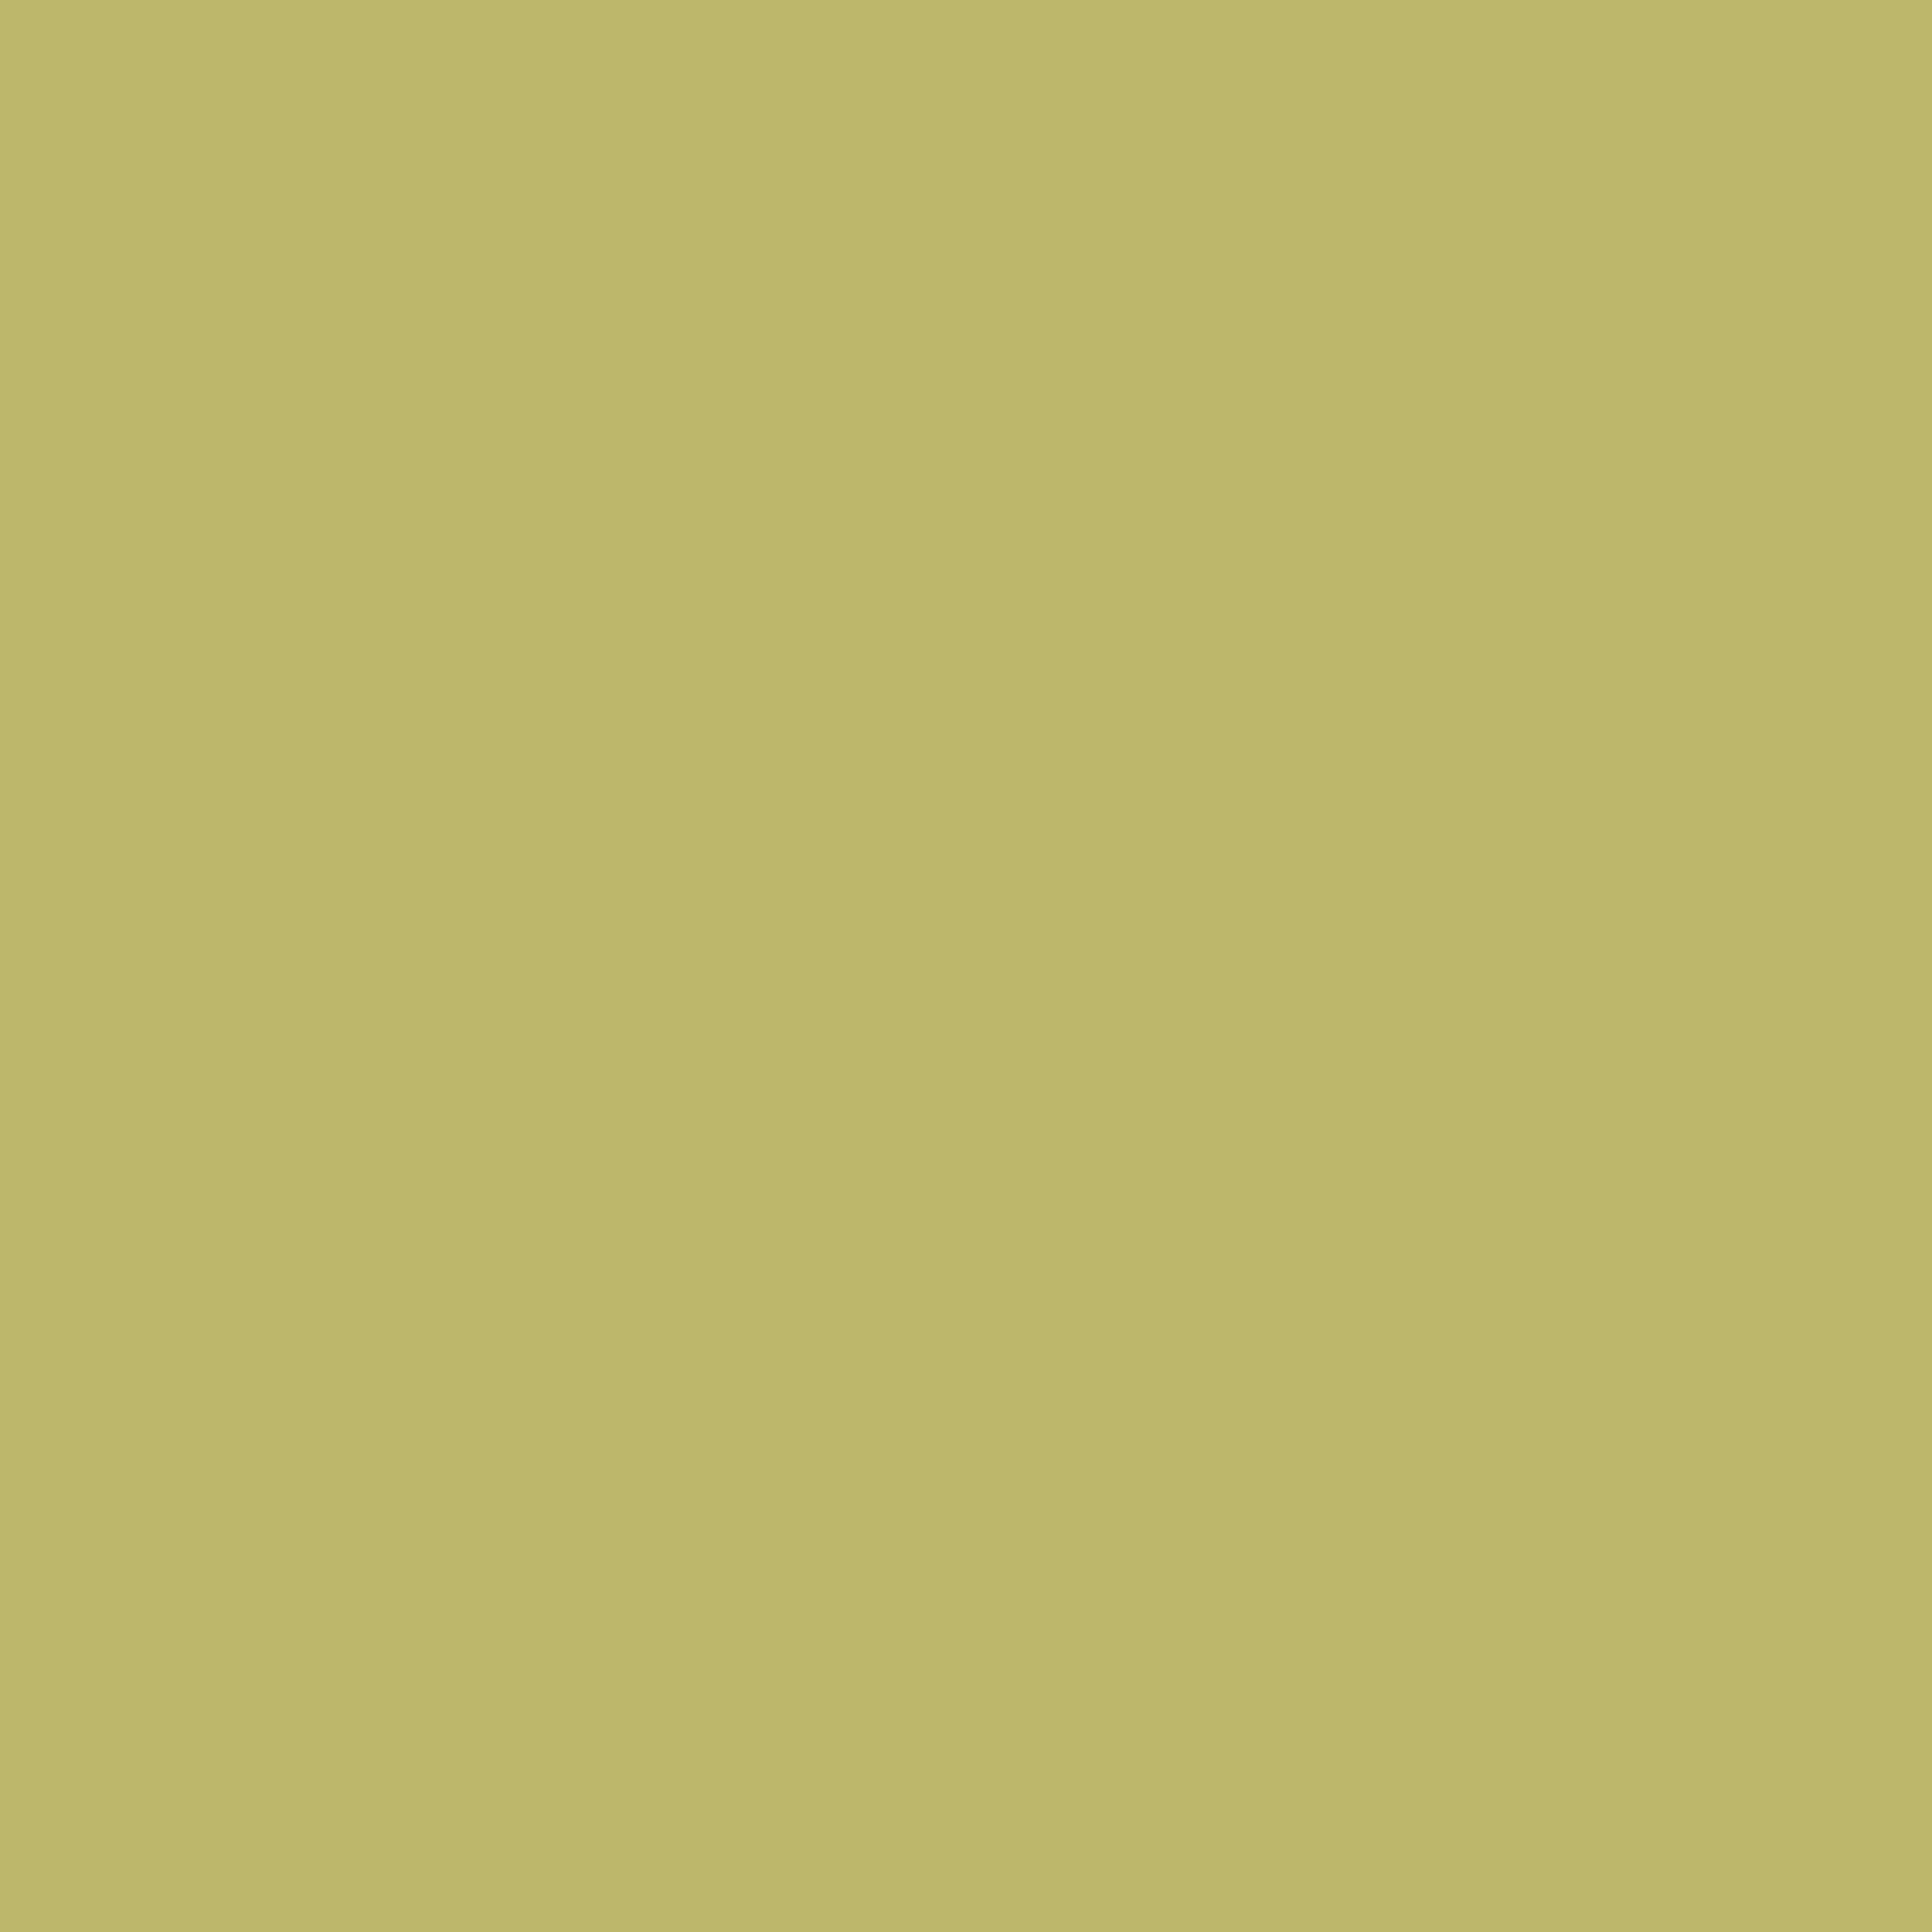 3600x3600 Dark Khaki Solid Color Background